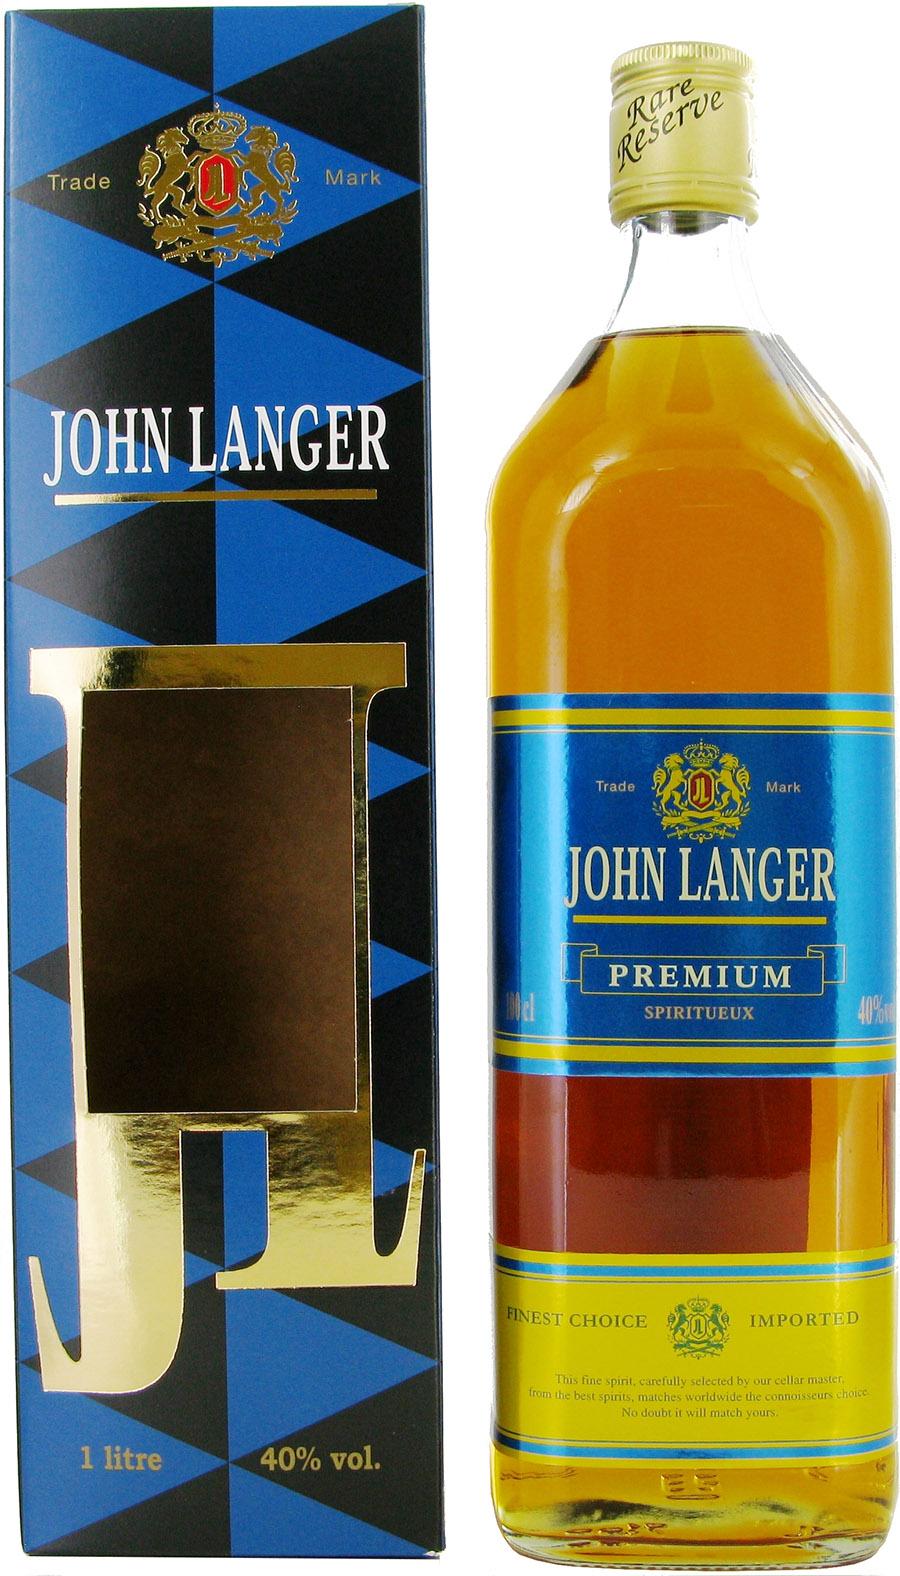 SPIRIT JOHN LANGER B 40 % - 1 L + COFFRET